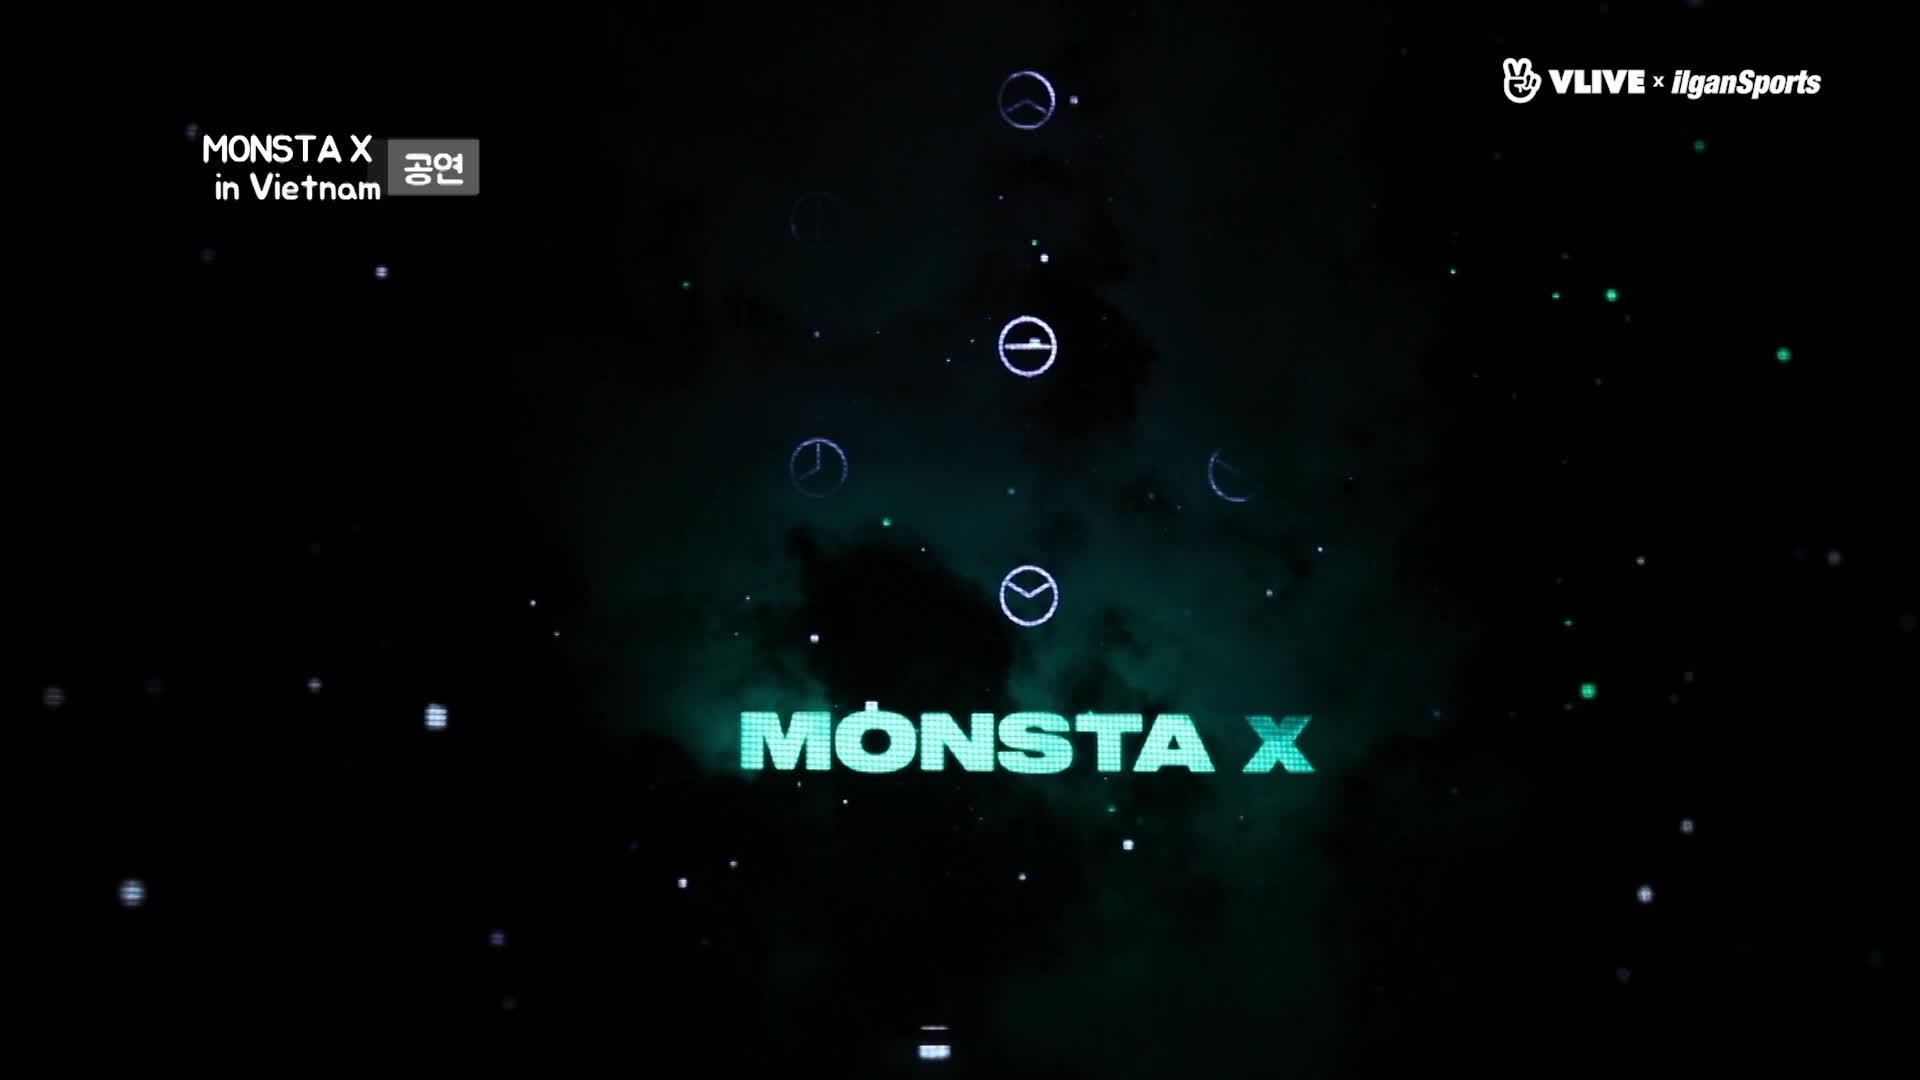 [MONSTA X in Vietnam] 두근두근 드디어 베트남 첫 공연과 대기실 비하인드